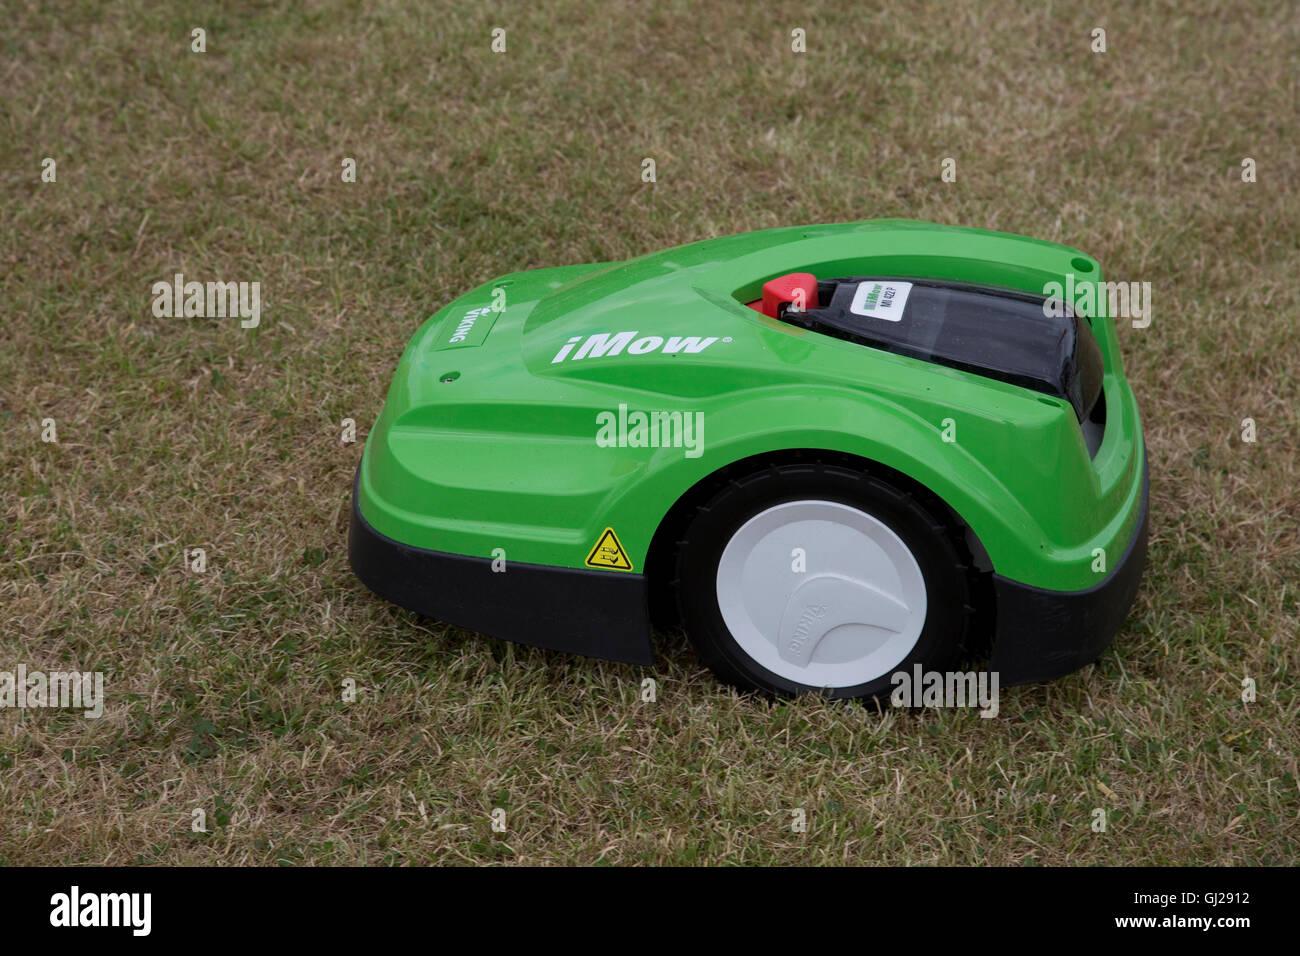 Green Viking MI 422 P iMow robotic lawn mower cutting grass Countryfile Live Blenheim UK Stock Photo